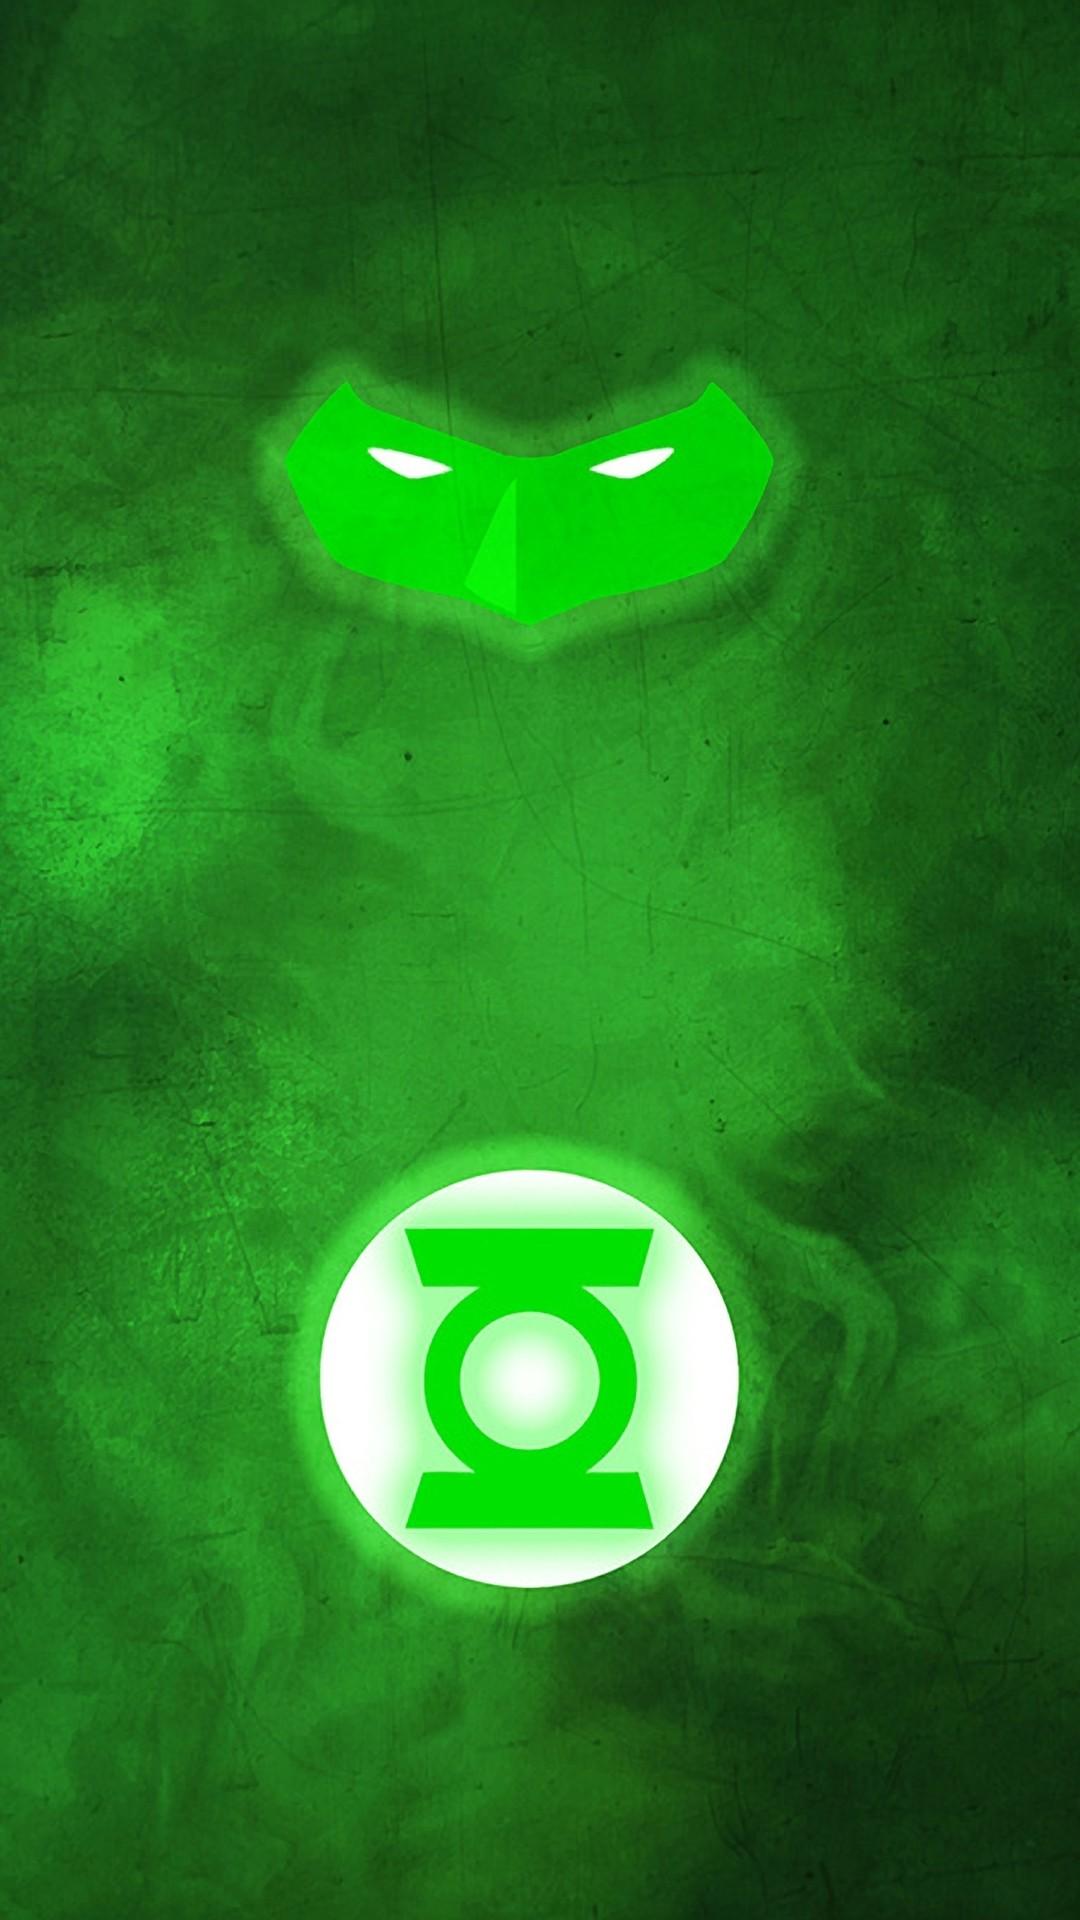 Green Lantern Iphone Iphone 6 Plus Wallpaper